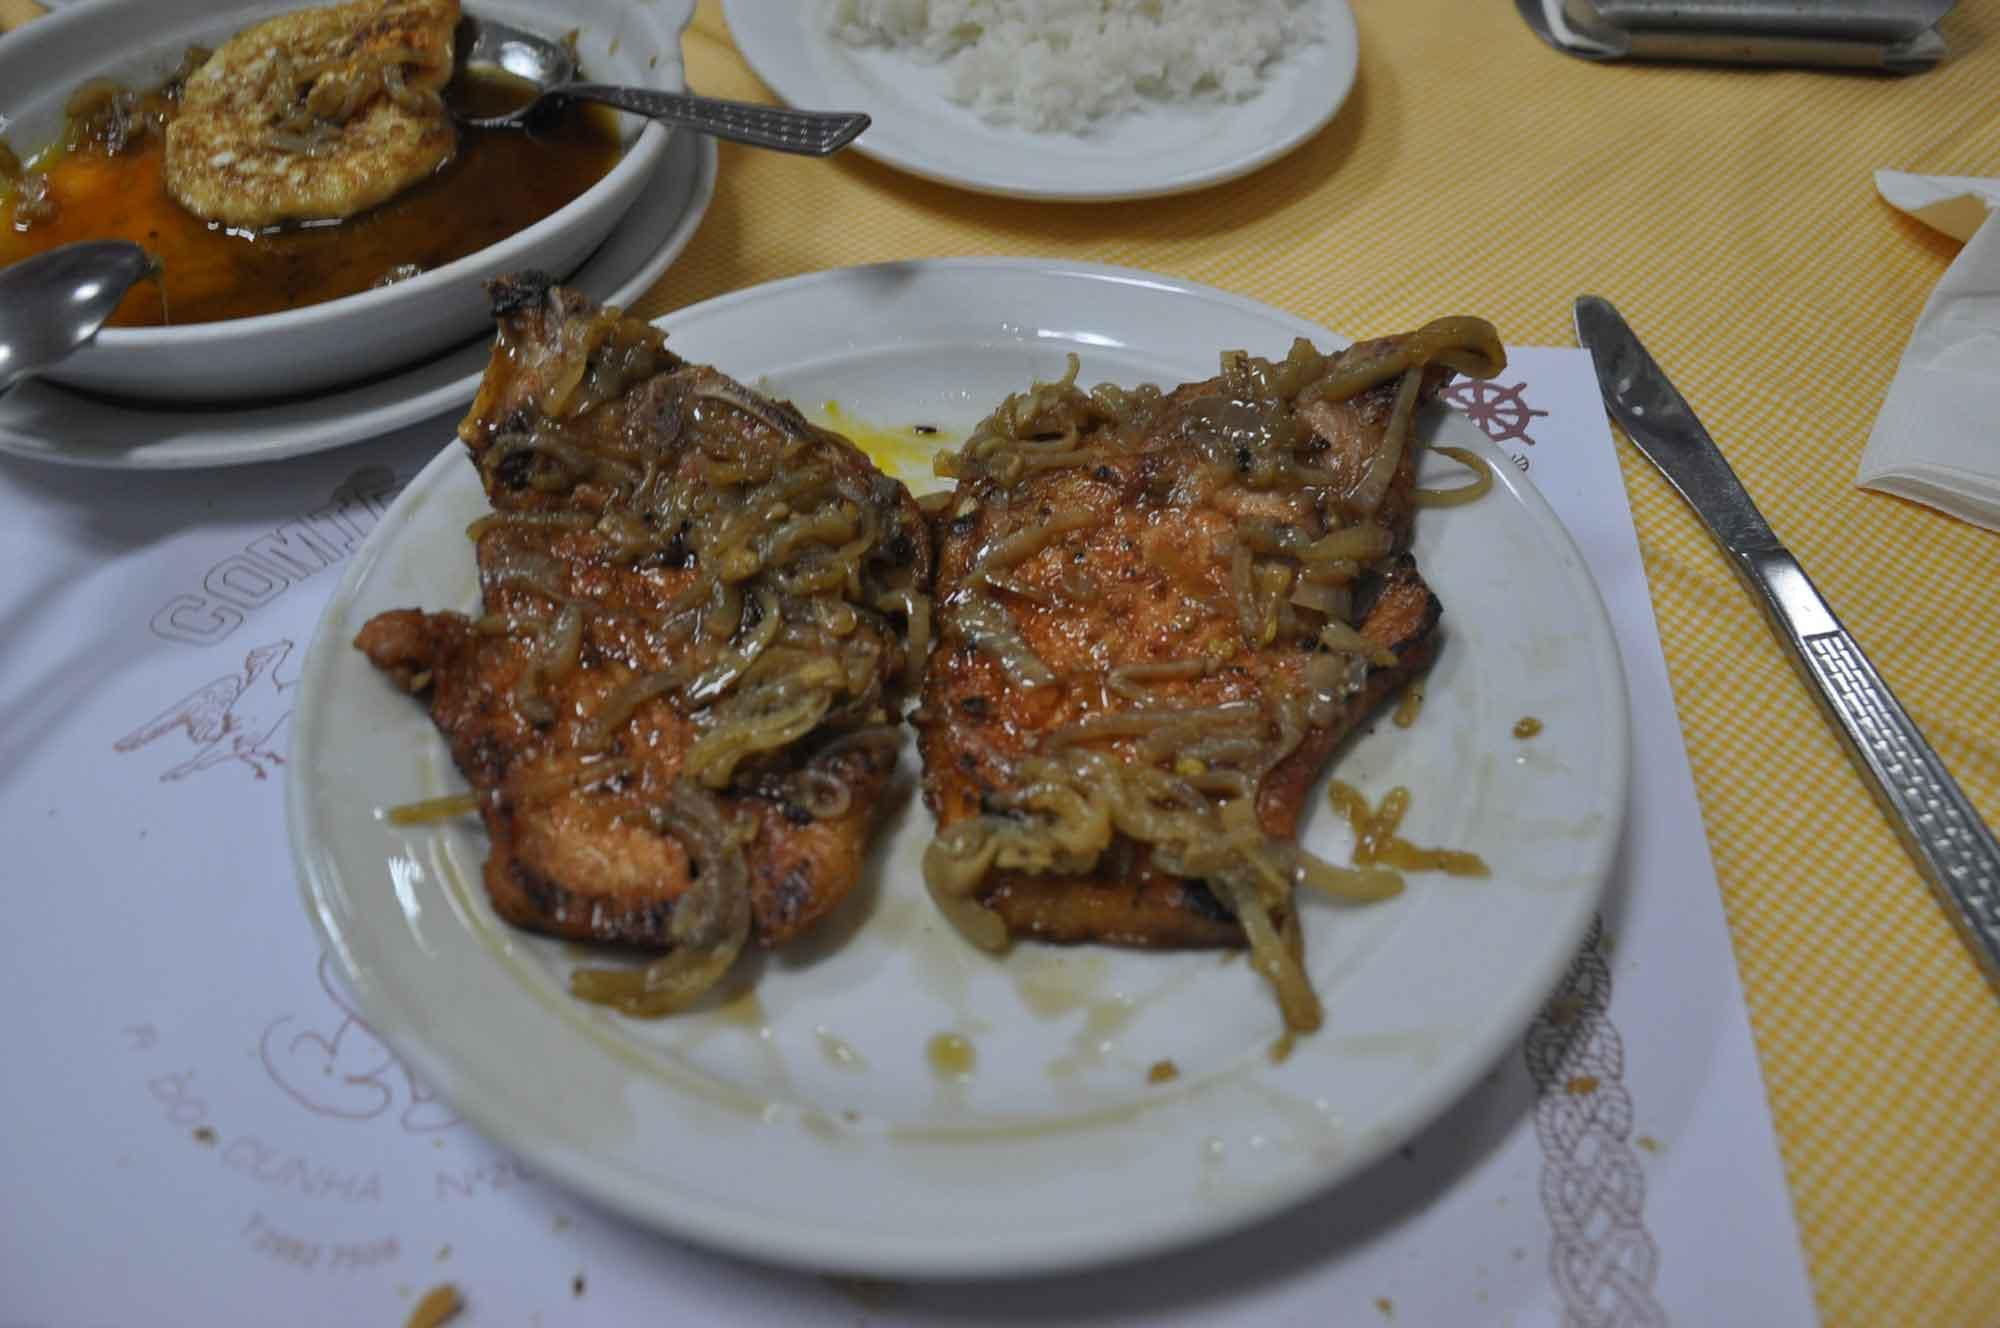 O Santos Macau pork chop with onions